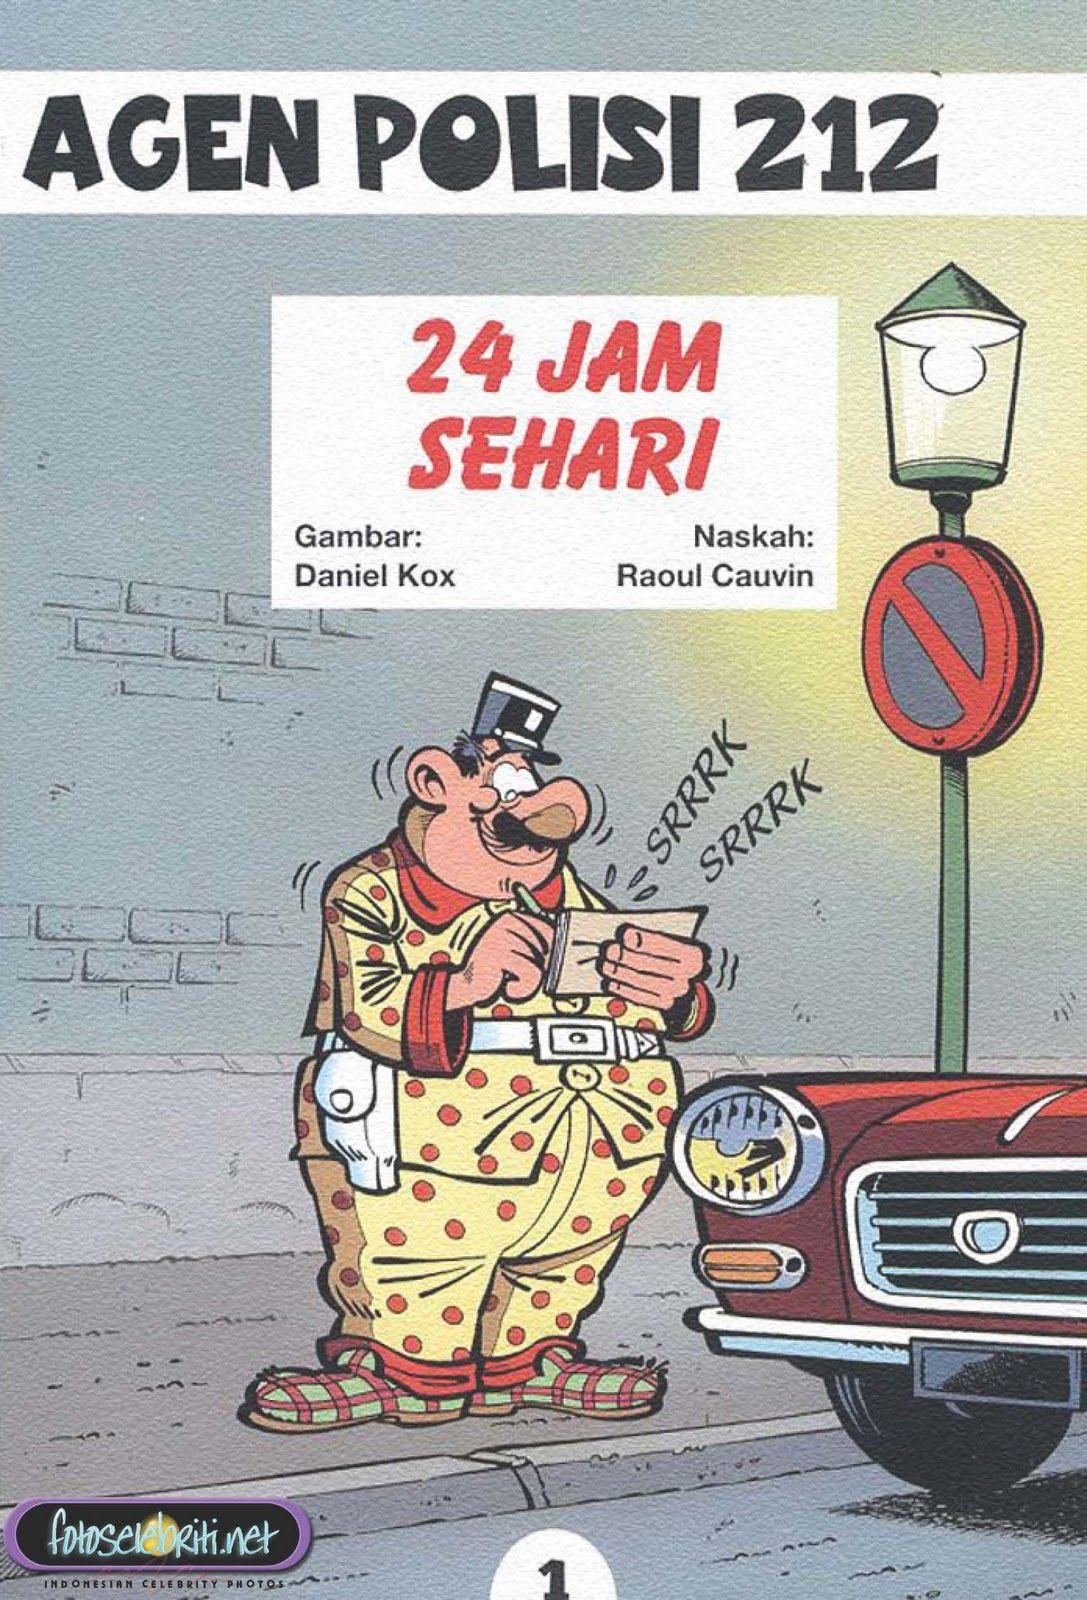 Komik Agen Polisi 212 Buku Komik Komik Komik Anak